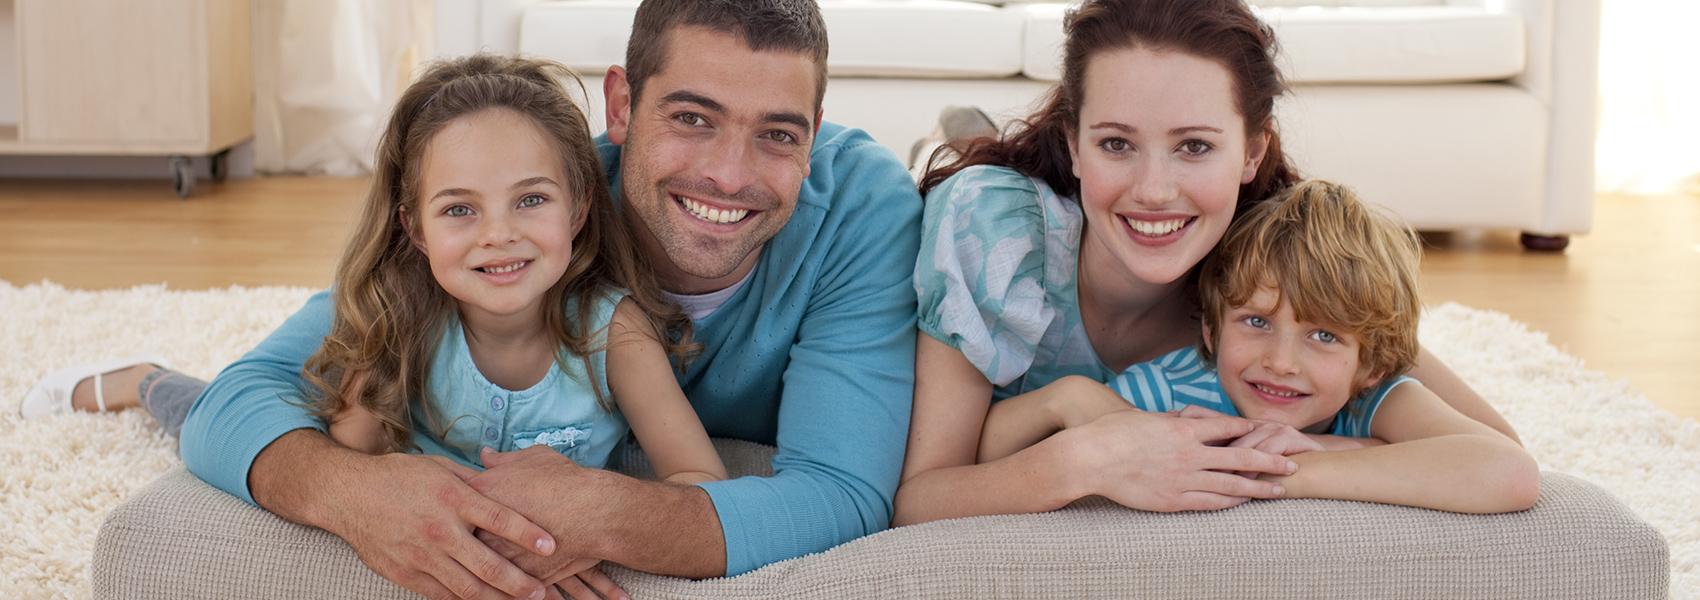 control de plagas hogar